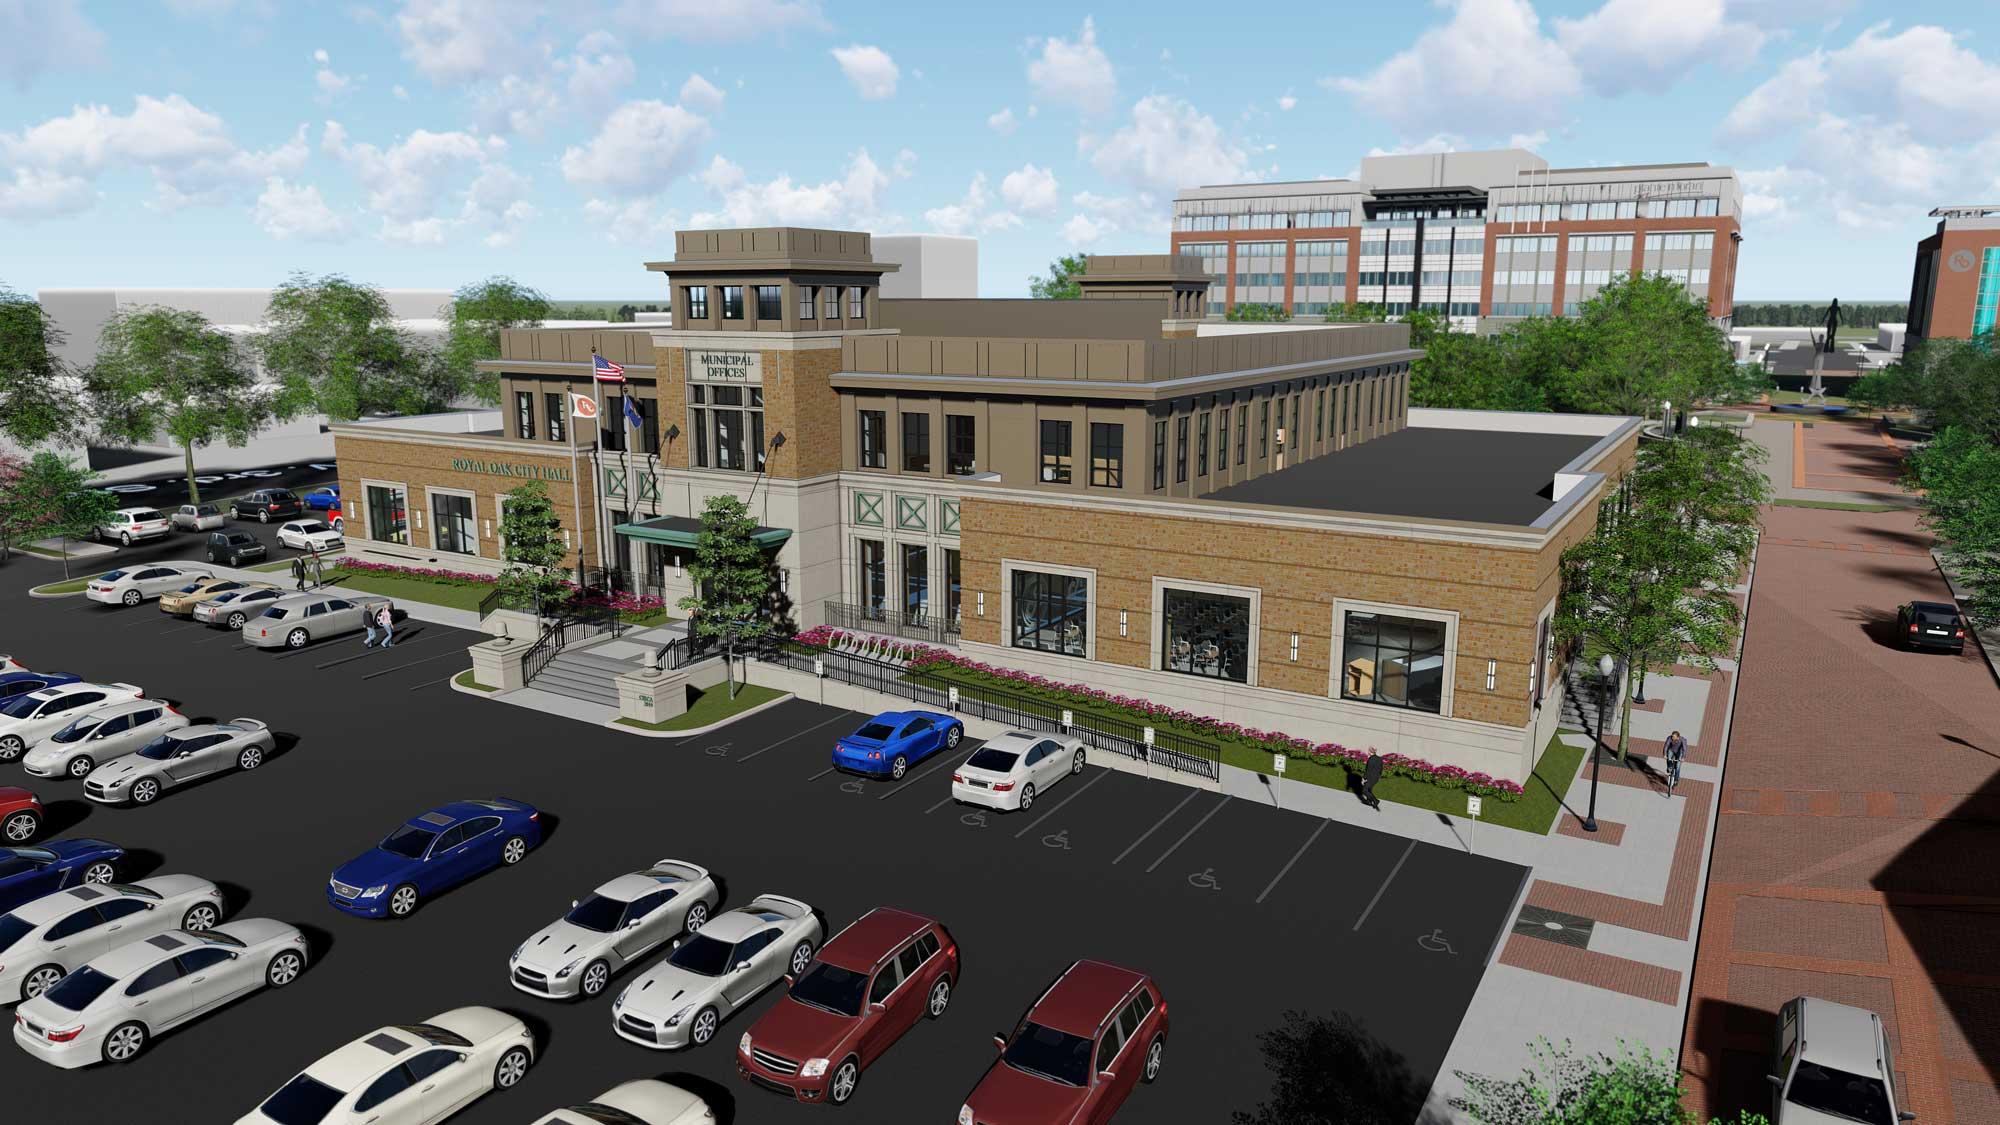 Royal Oak City Hall site exterior rendering